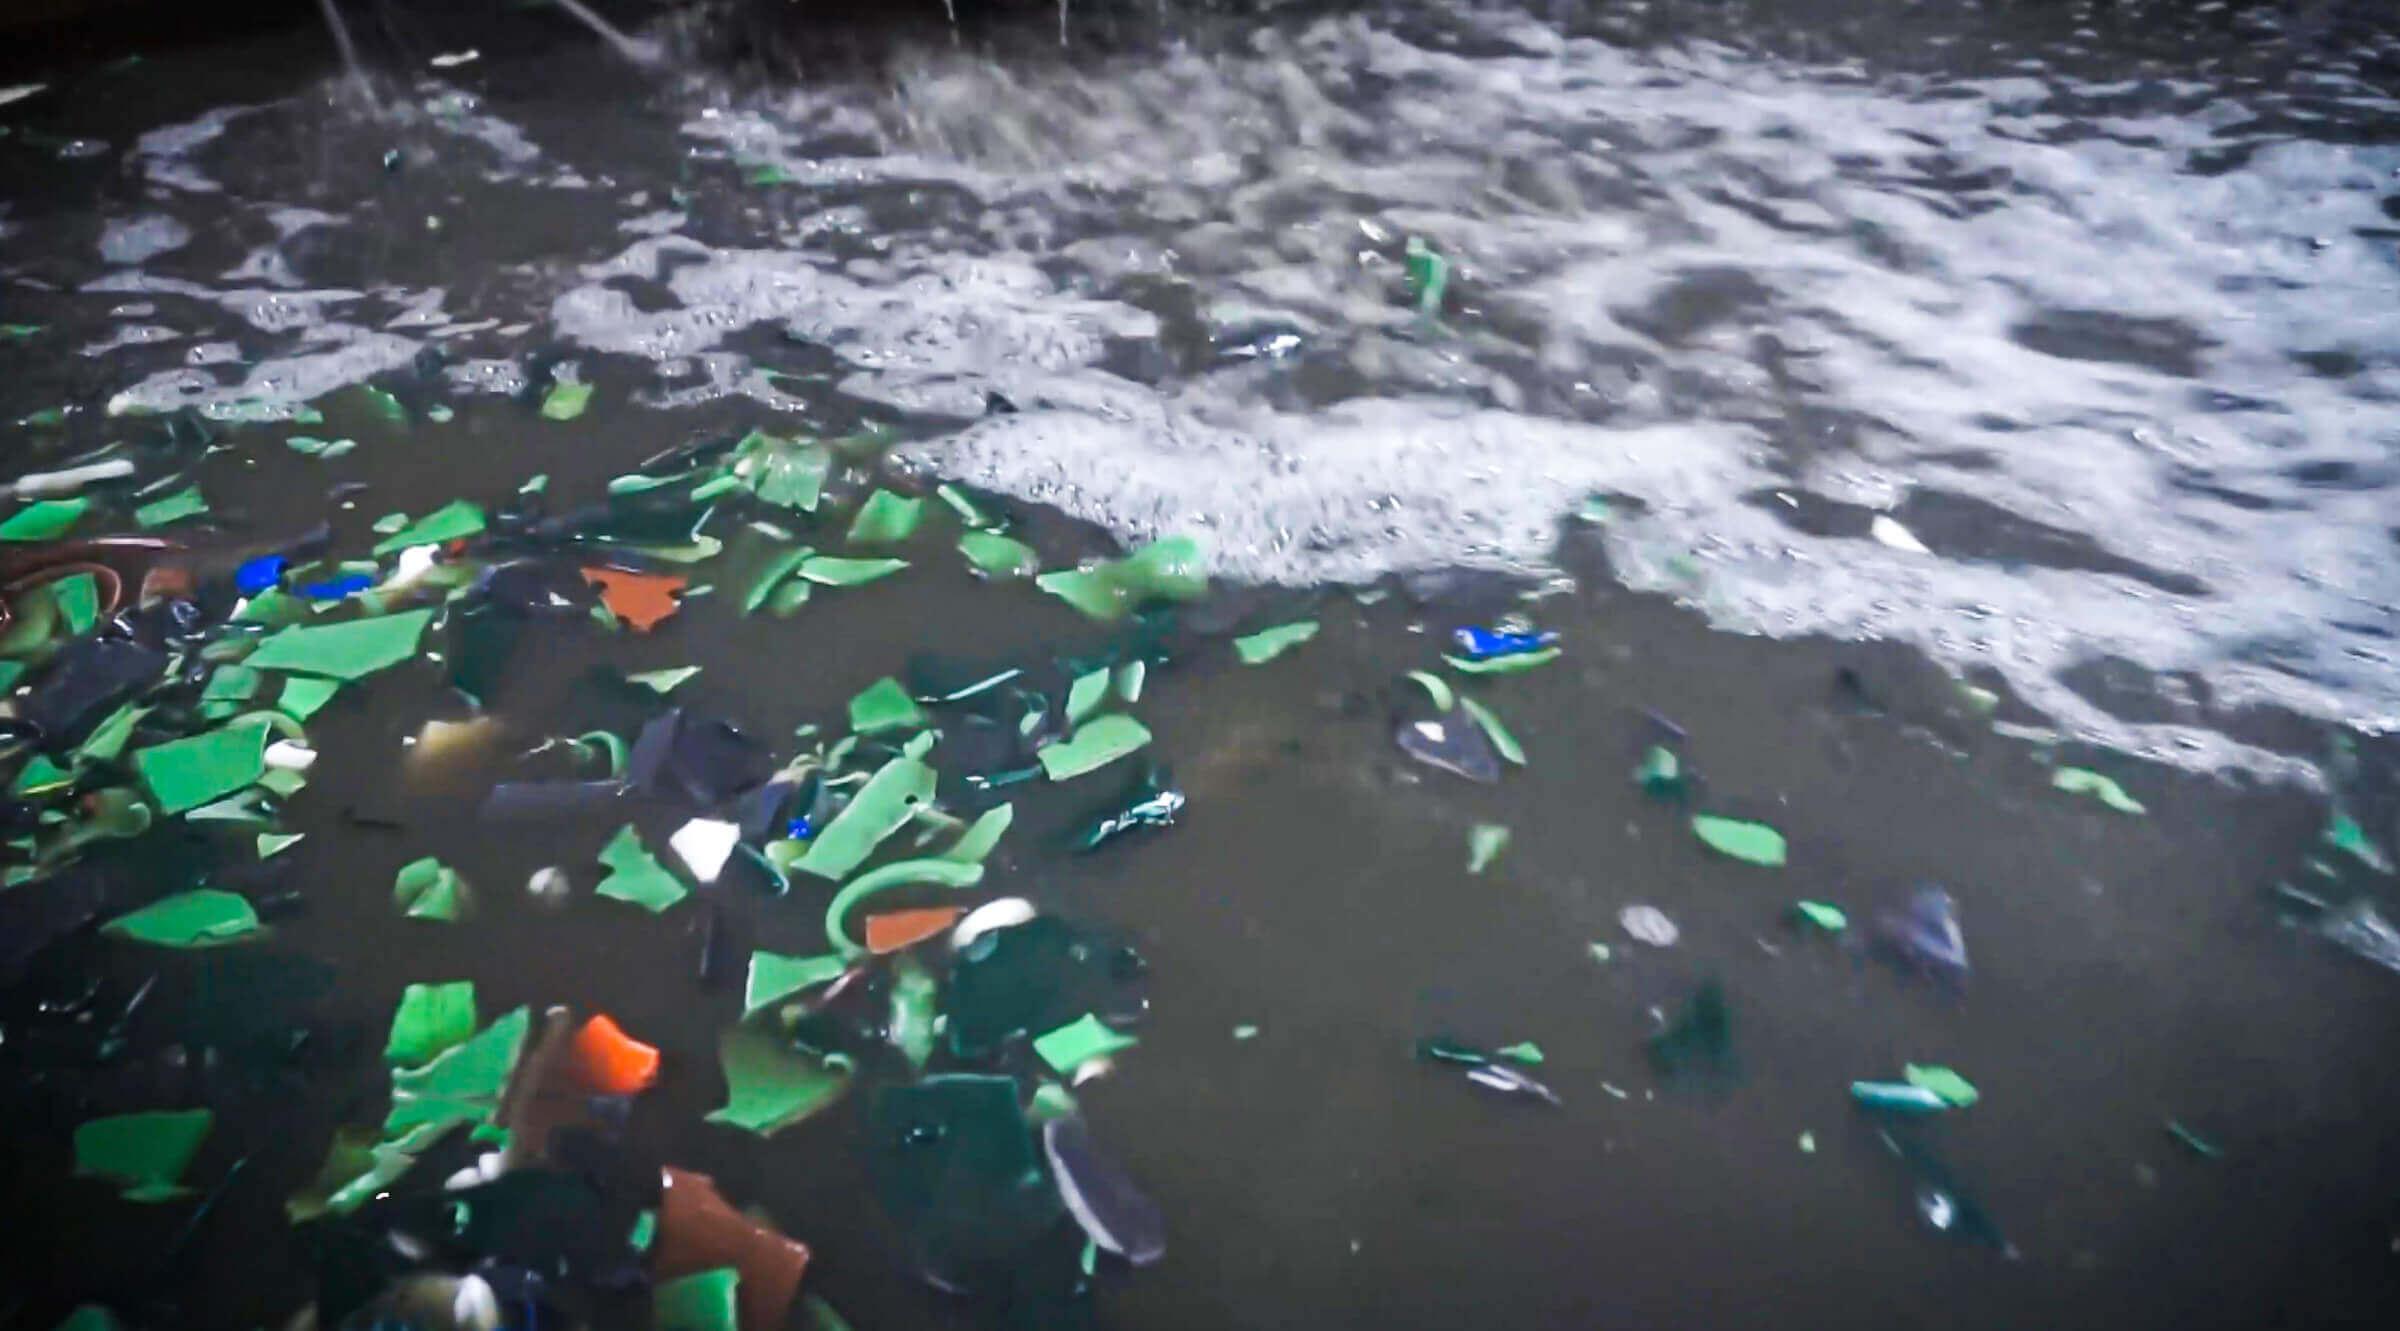 Washing of the shredded plastic